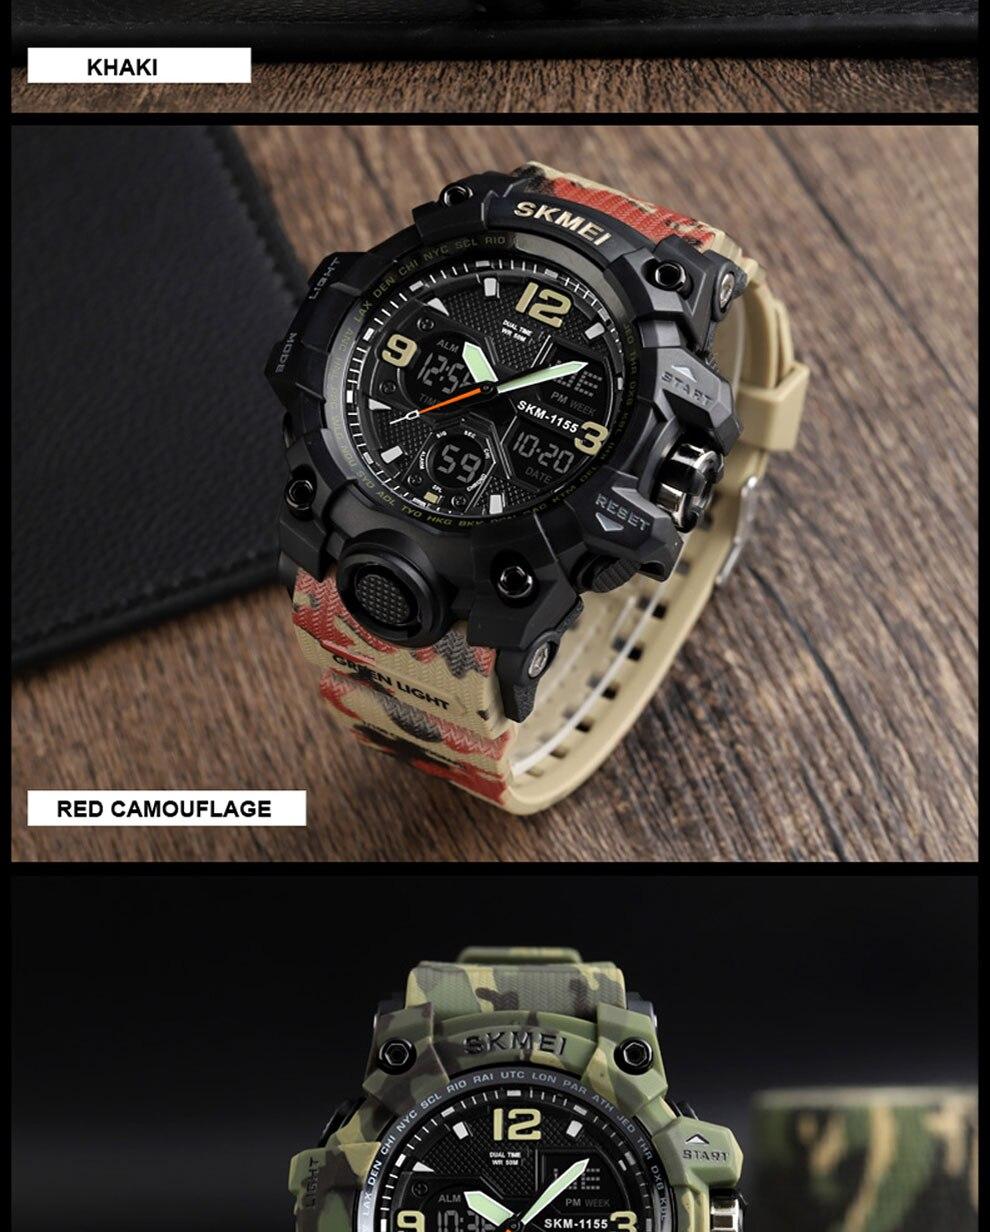 HTB1IHlARAvoK1RjSZFwq6AiCFXaP SKMEI Brand Luxury Military Sports Watches Men Quartz Analog LED Digital Clock Man Waterproof Dual Display Wristwatches Relogio